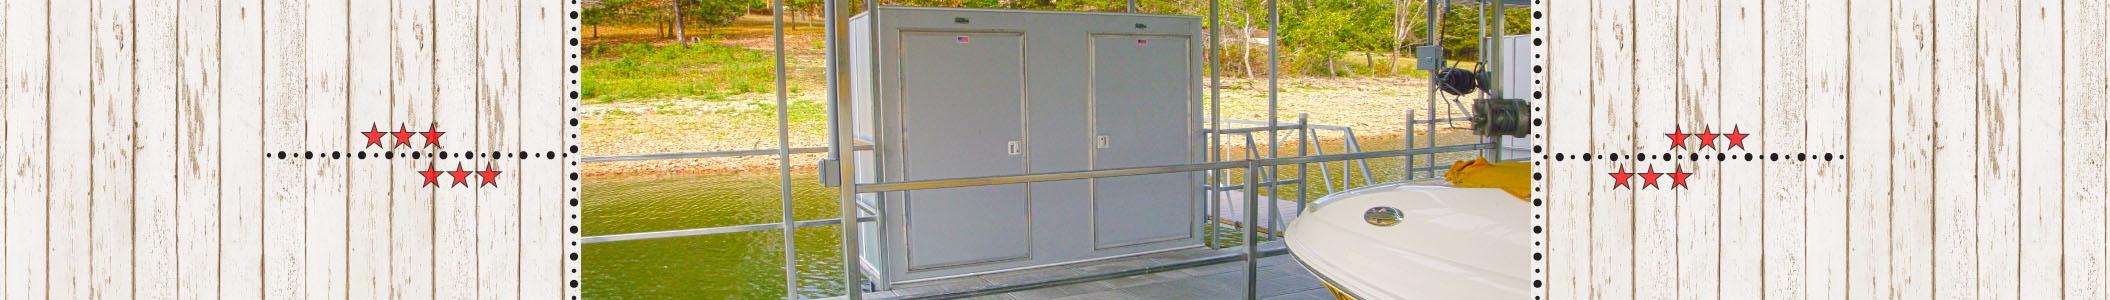 Stow It Safe Dock Lockers & Storage Lockers Table Rock Lake Missouri